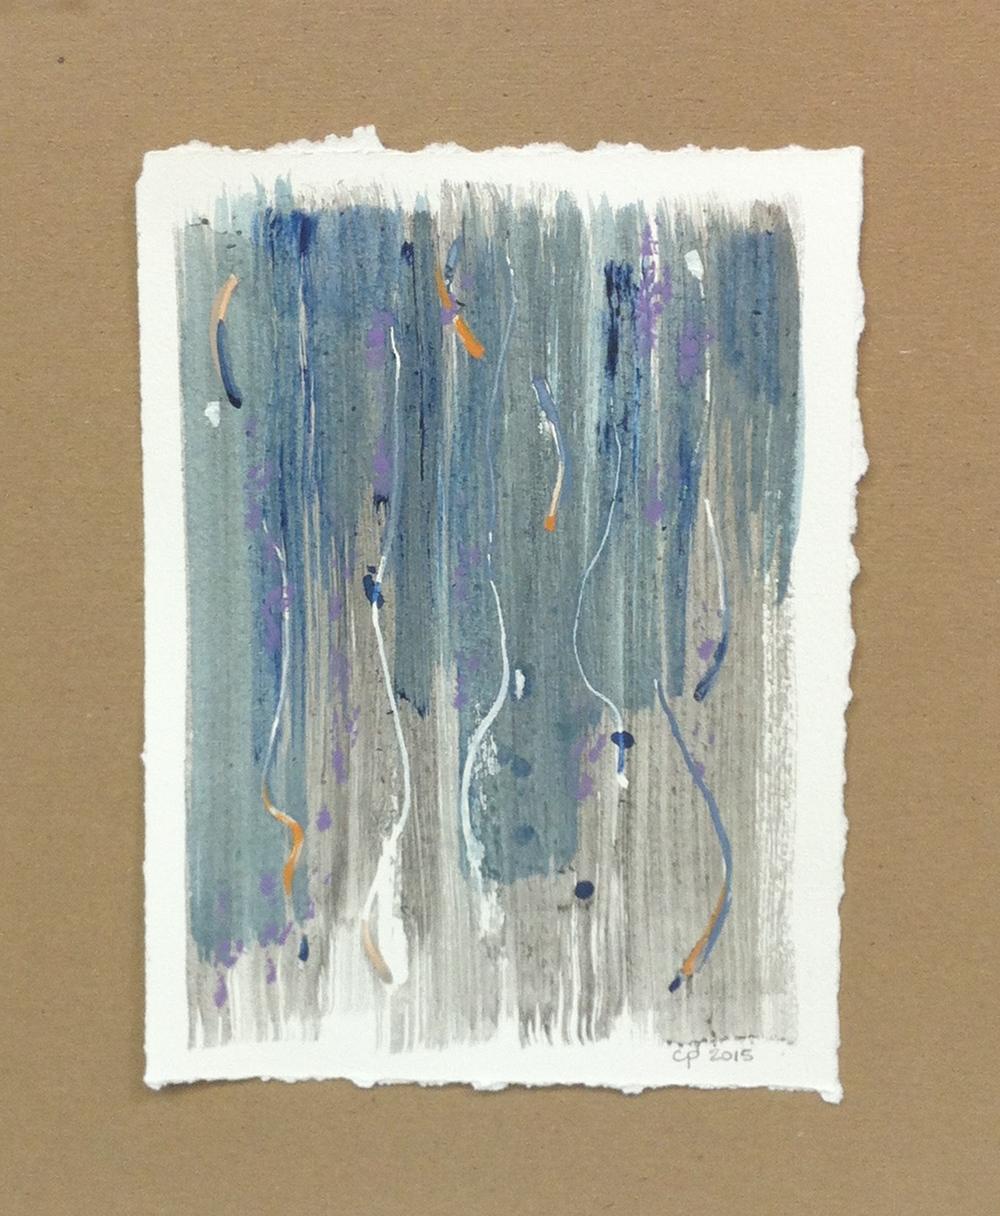 Gift - mixed medium on paper